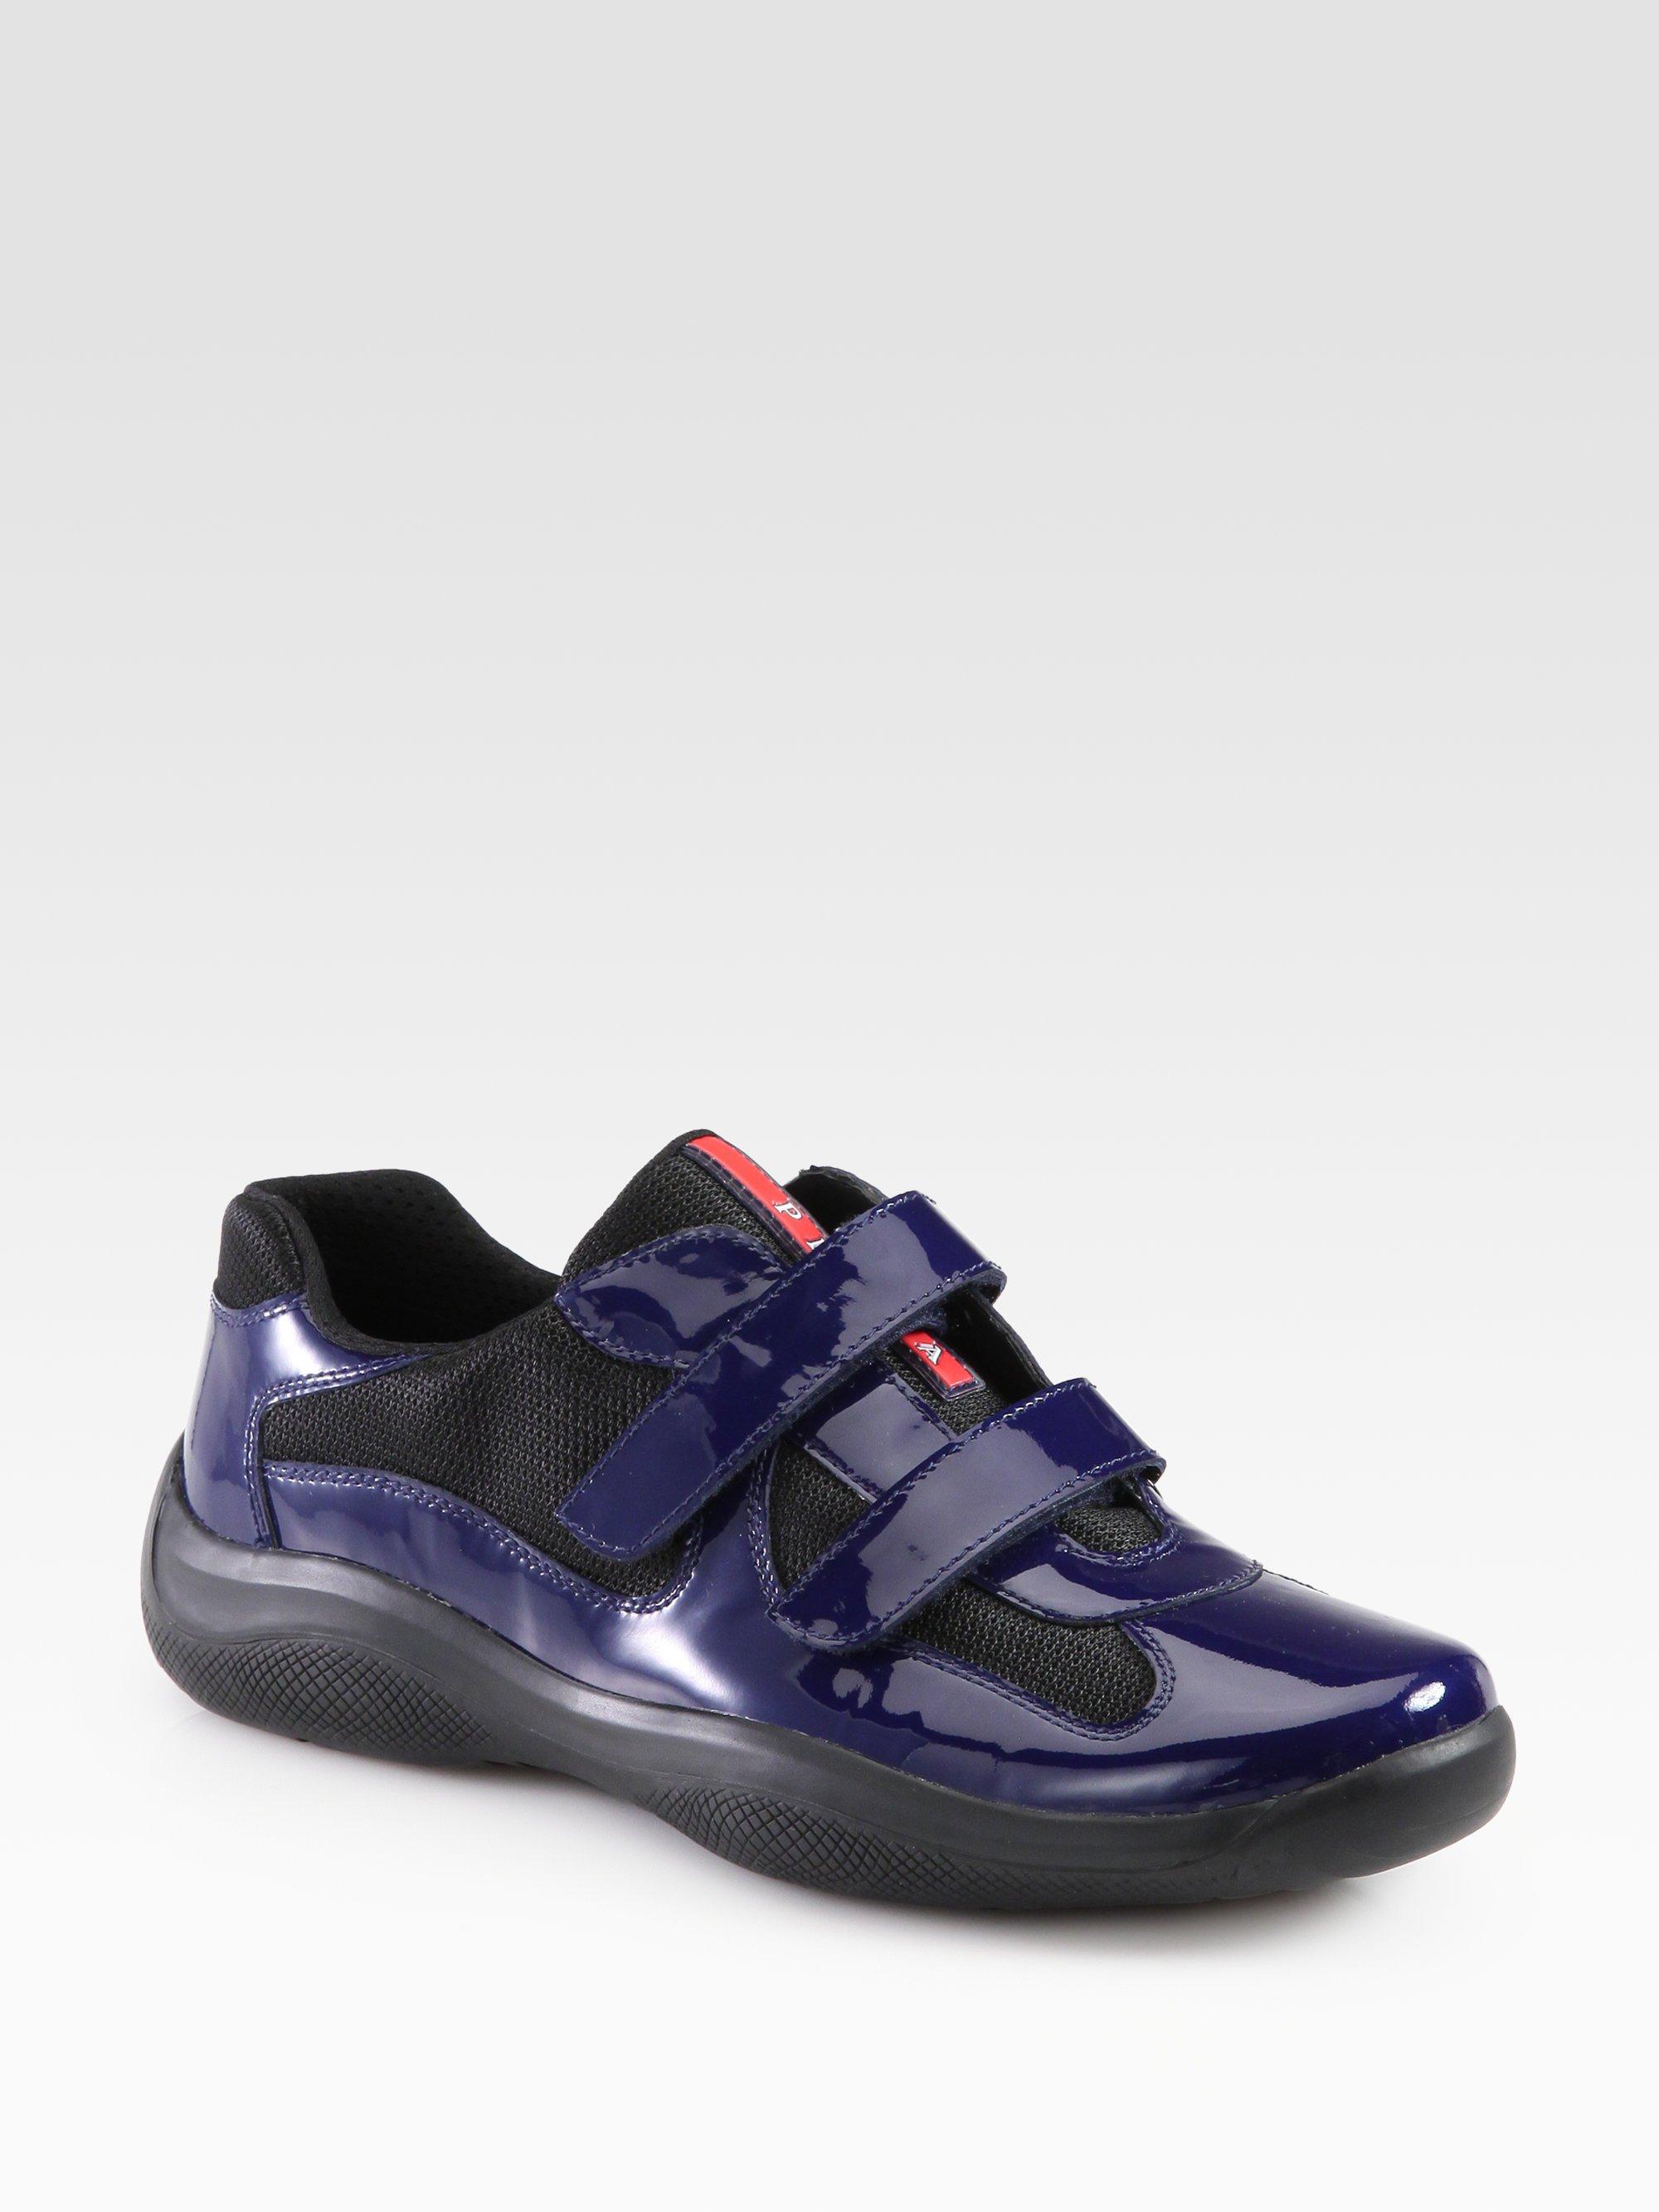 prada nylon tote with zipper - Prada Double Strap Sneakers in Blue for Men (royal black) | Lyst